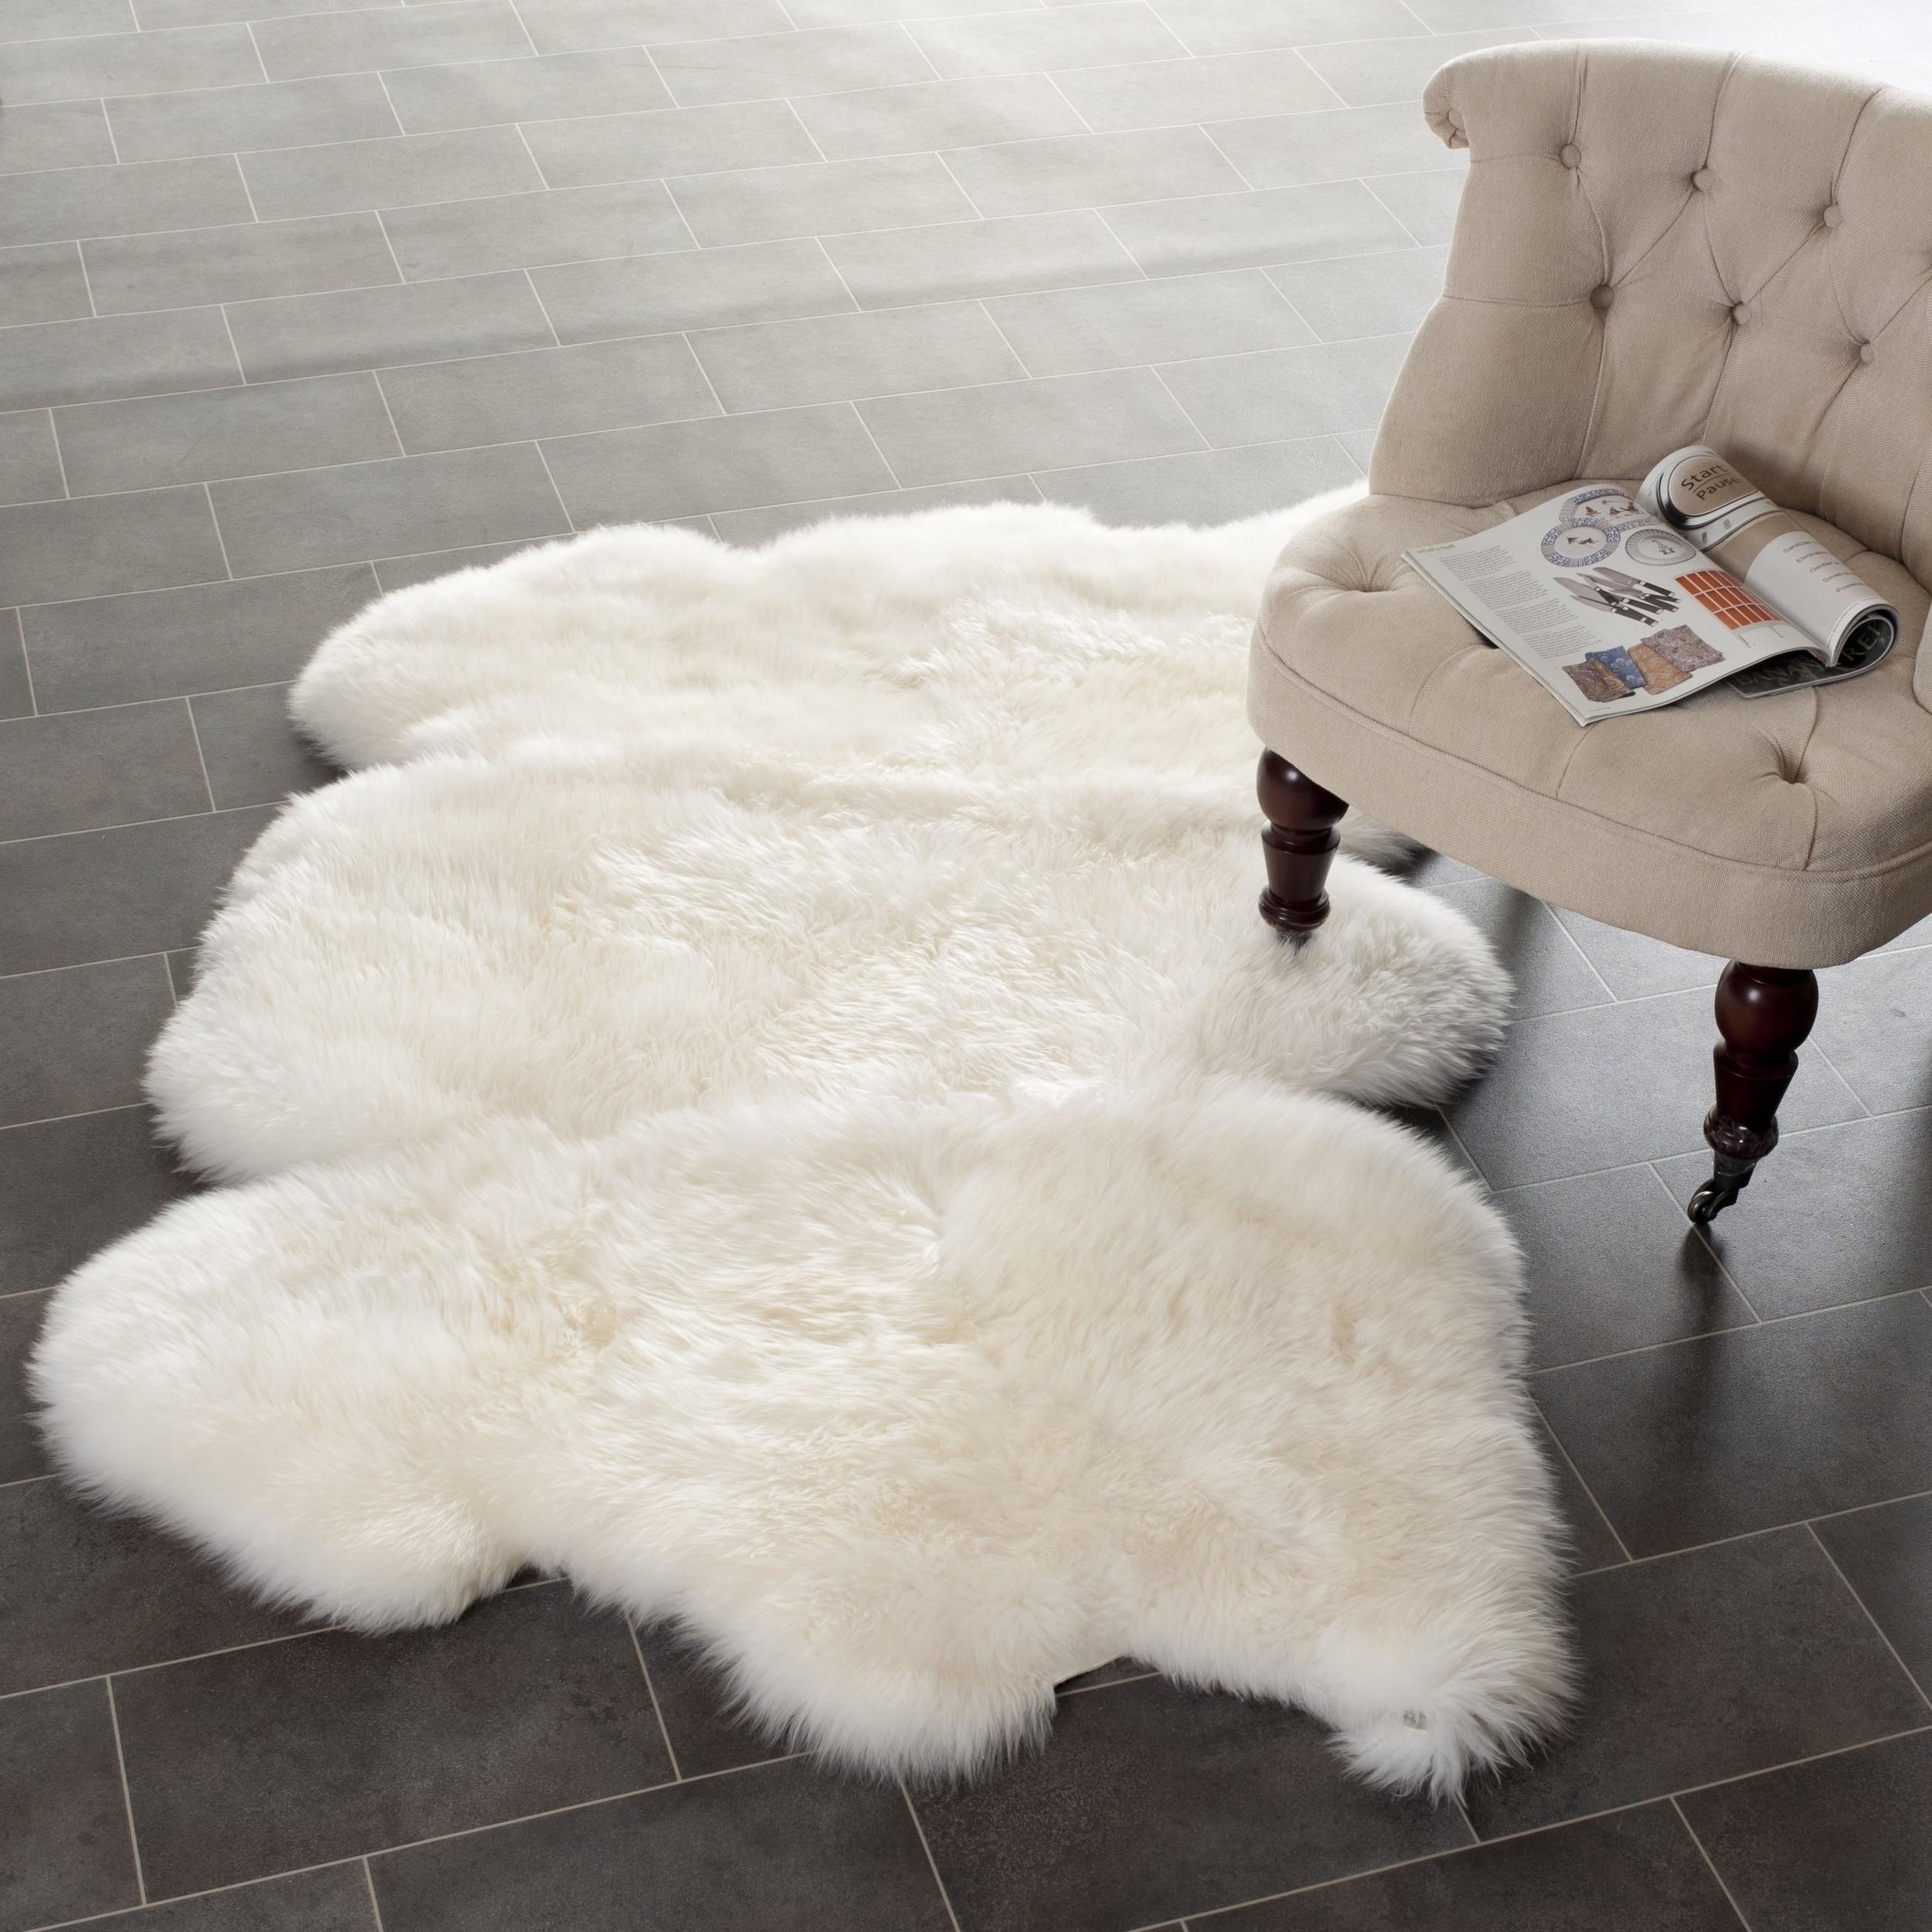 Safavieh Prairie Natural Pelt Sheepskin Wool White Shag Rug (3' x 5')